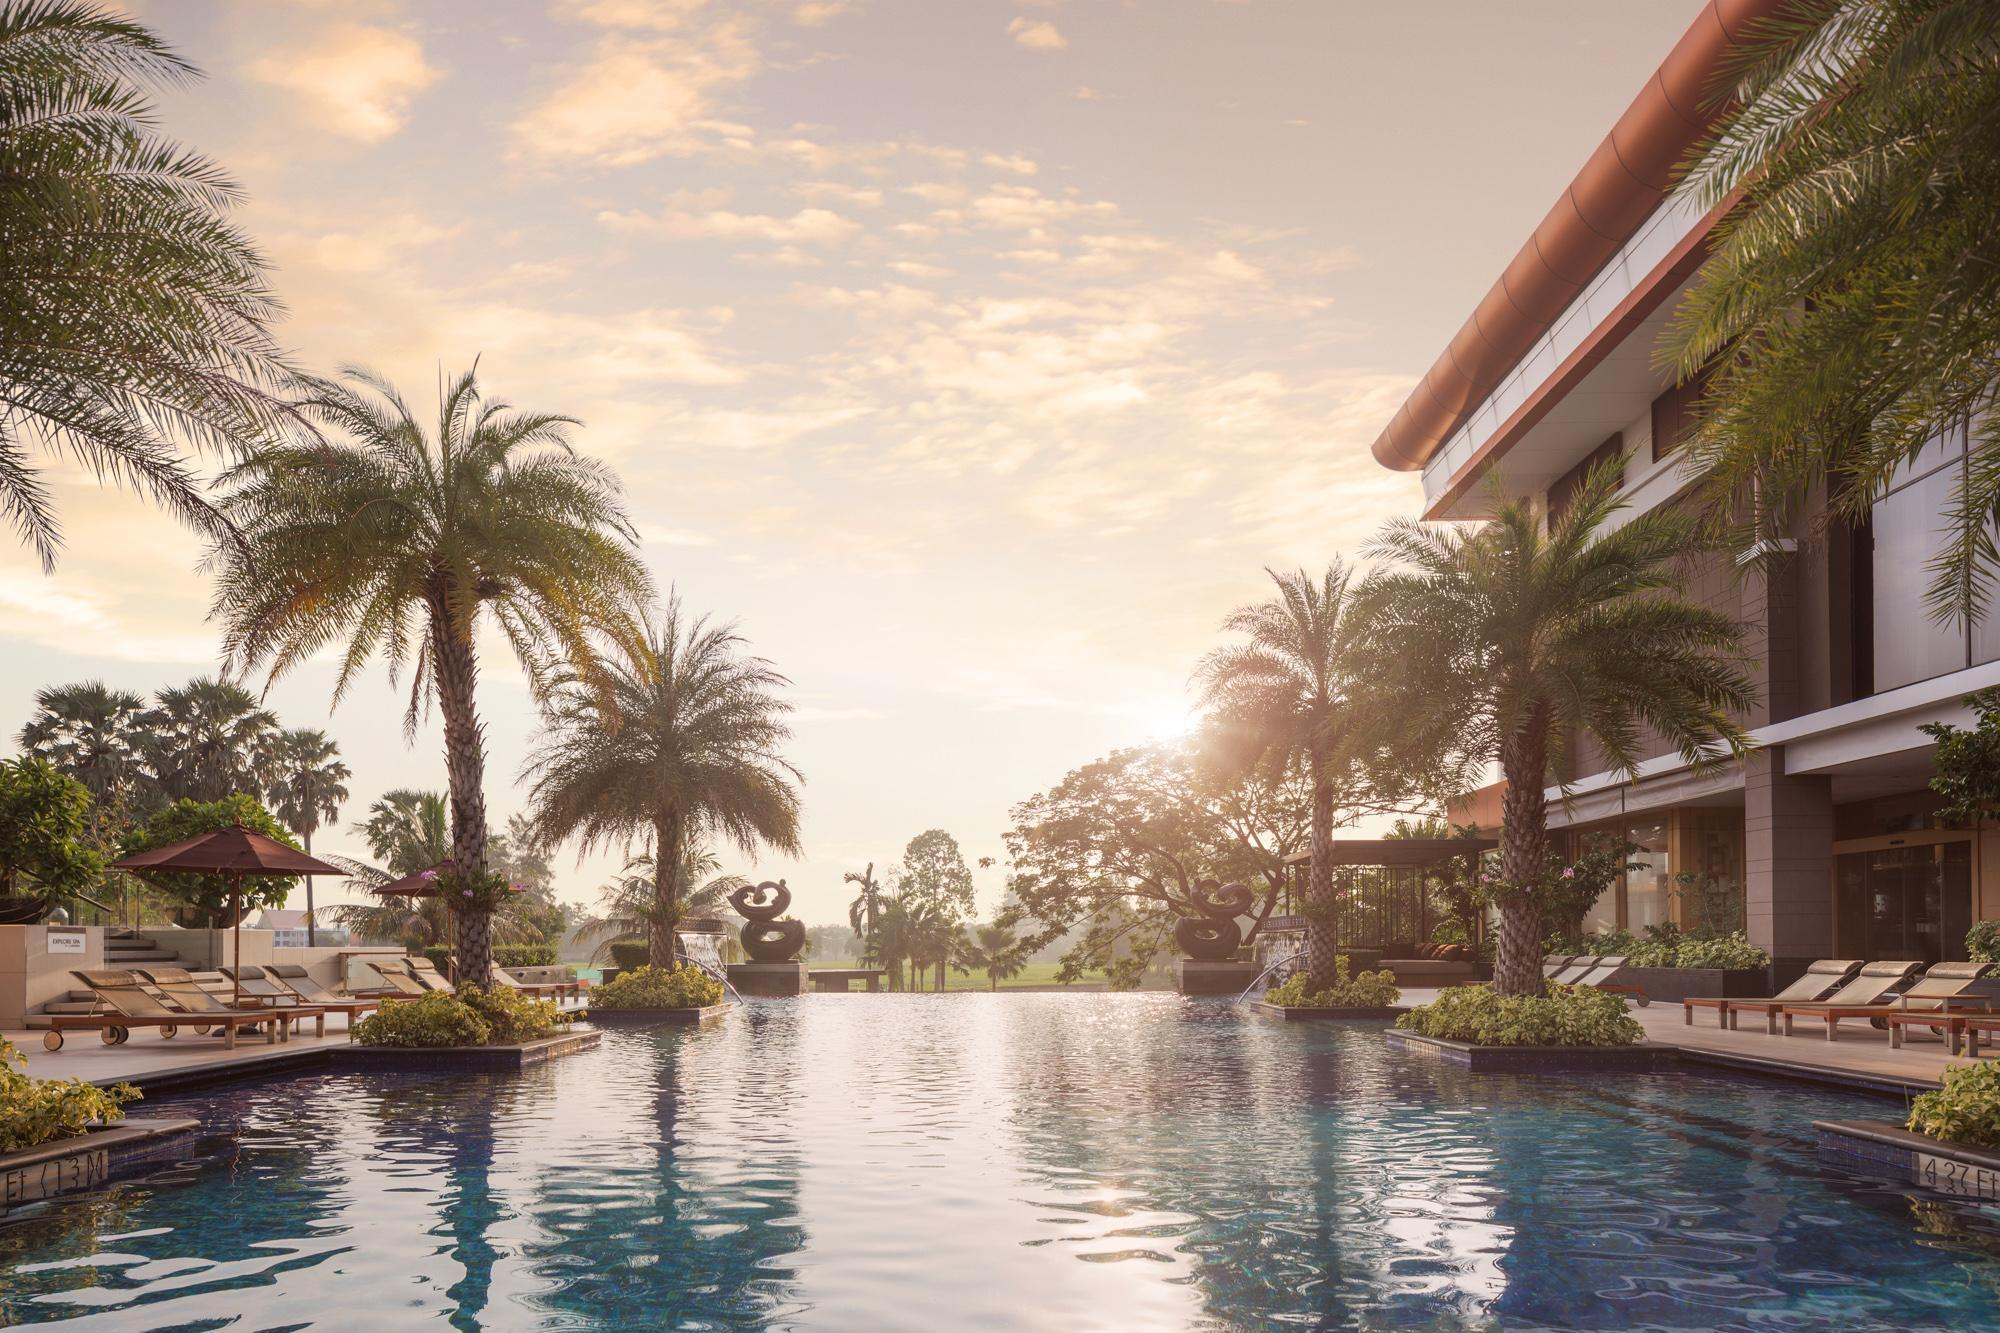 Le Méridien Suvarnabhumi, Bangkok Golf Resort & Spa เลอ เมริเดียน สุวรรณภูมิ กรุงเทพฯ กอล์ฟ รีสอร์ต แอนด์ สปา